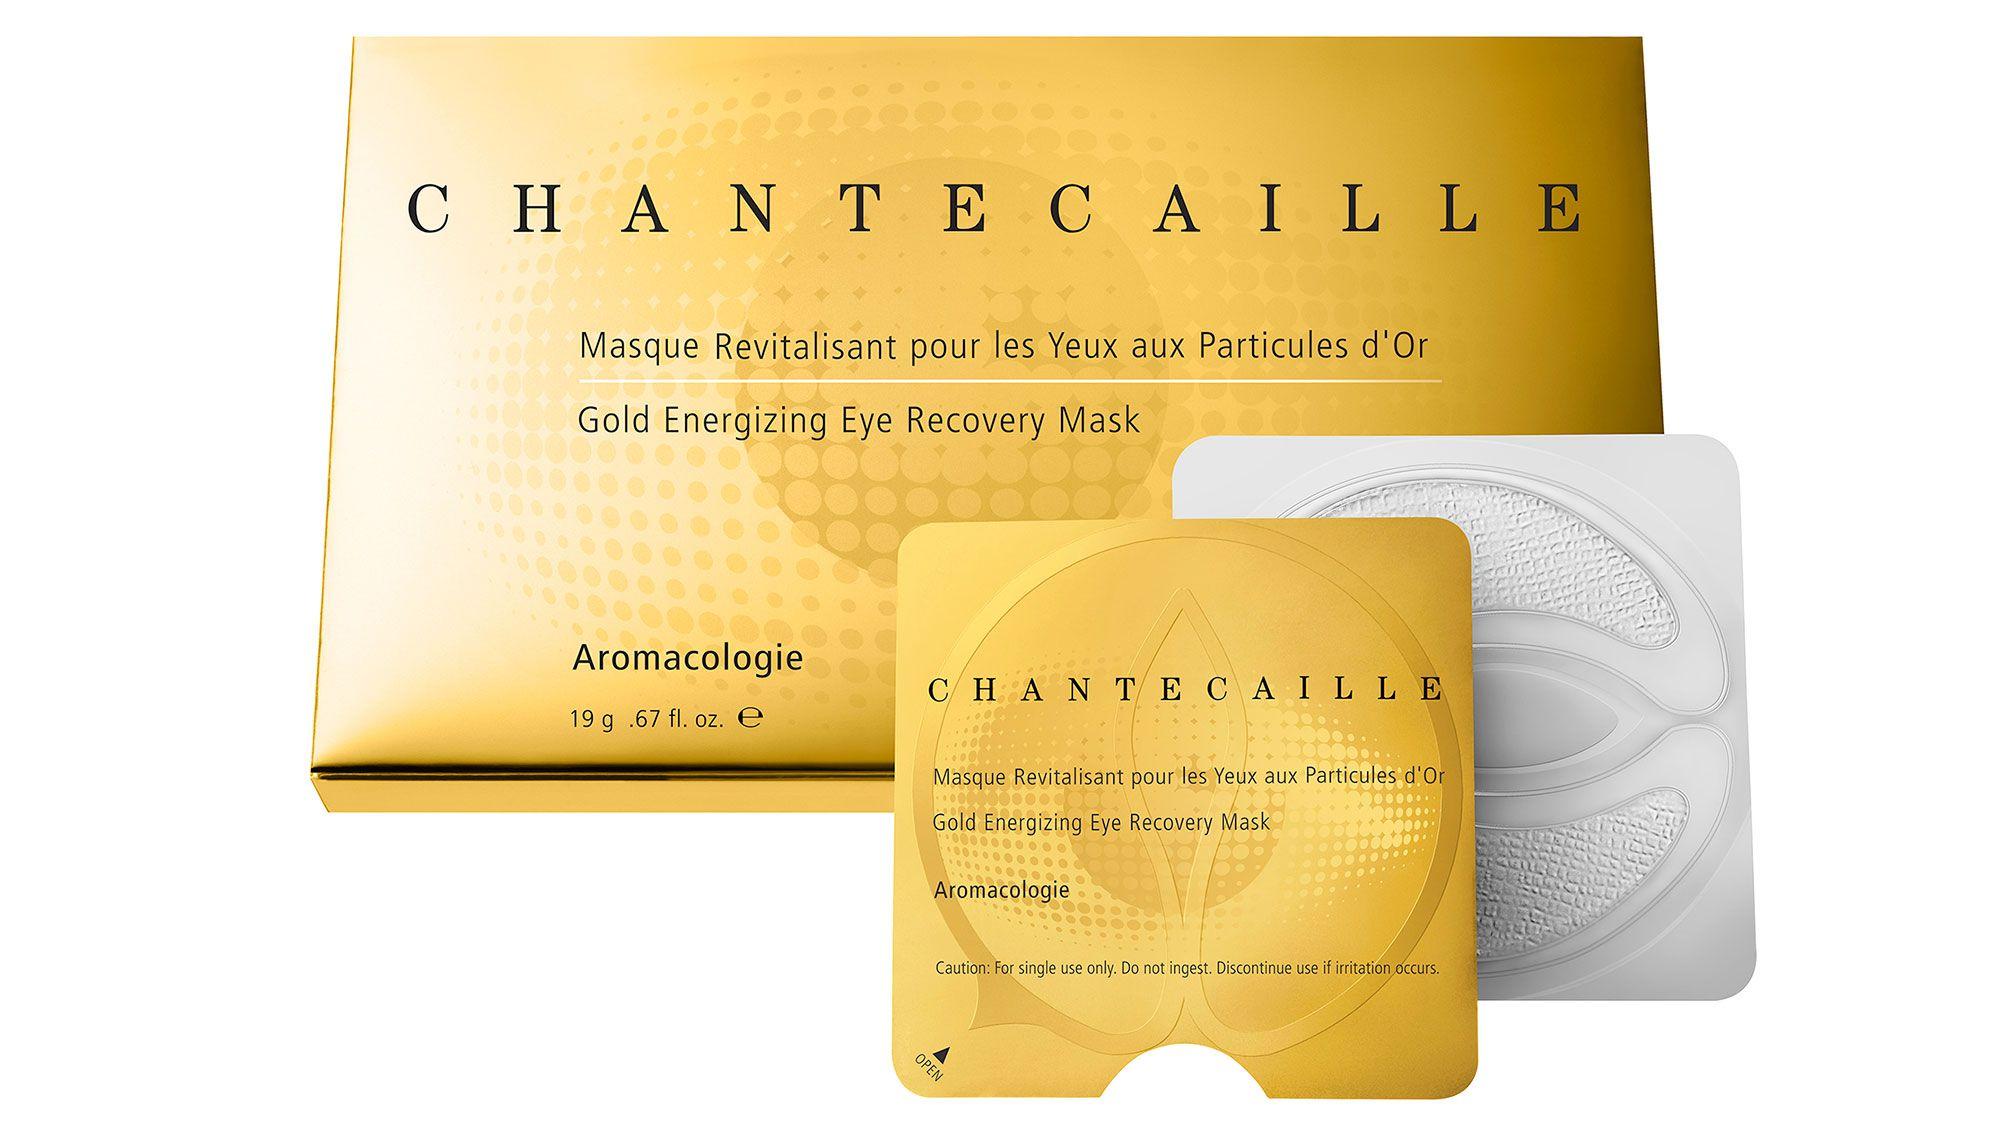 Chantecaille 24K Energizing Eye Mask